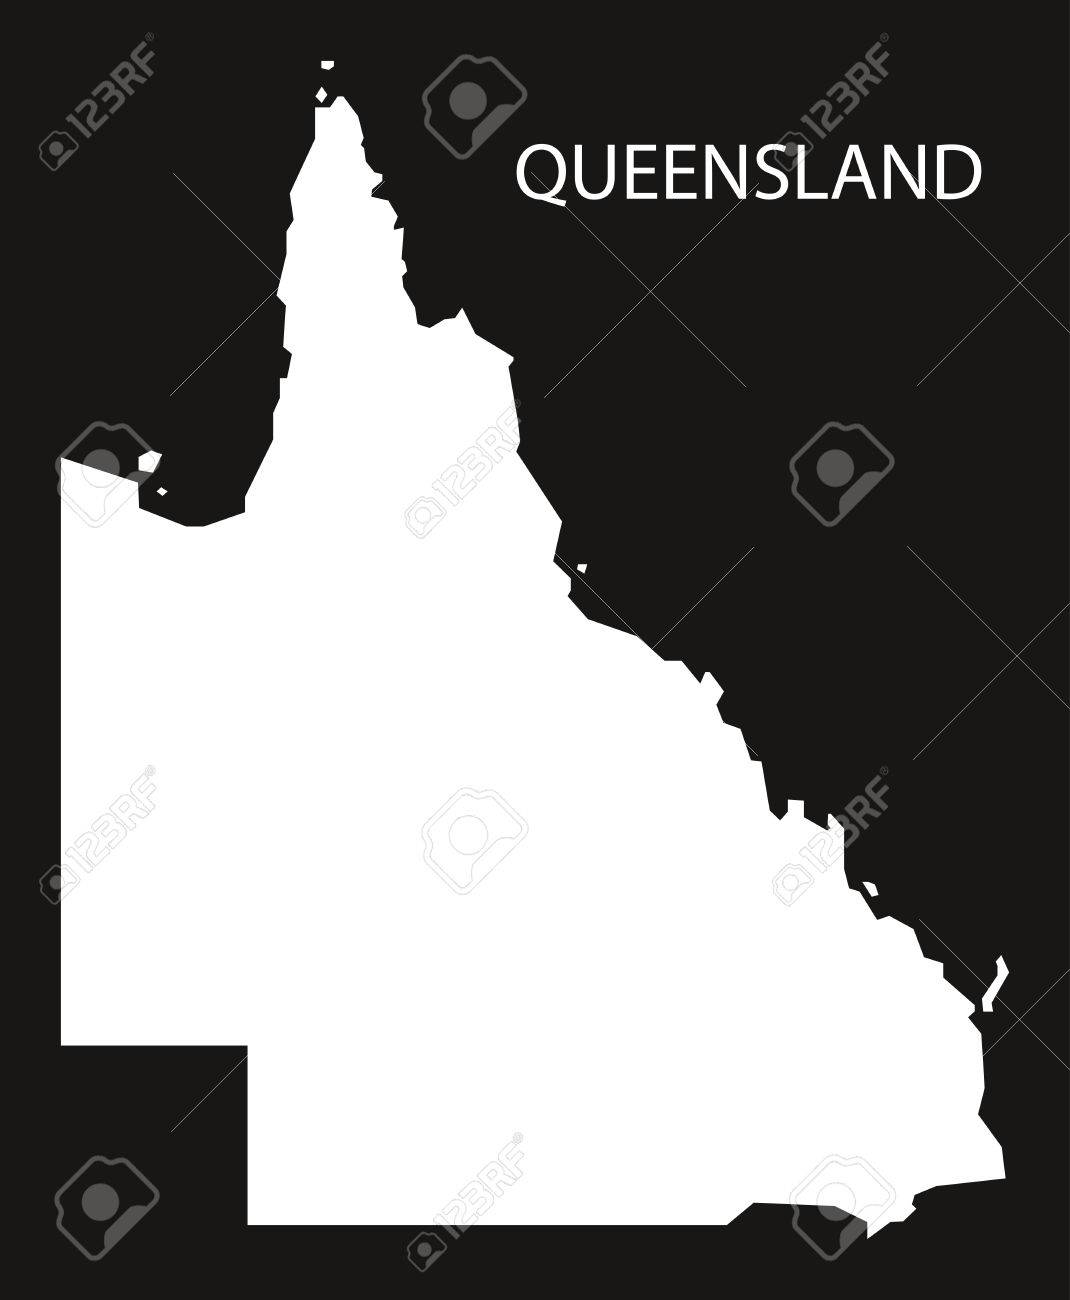 Map Queensland Australia.Queensland Australia Map Black Inverted Silhouette Illustration